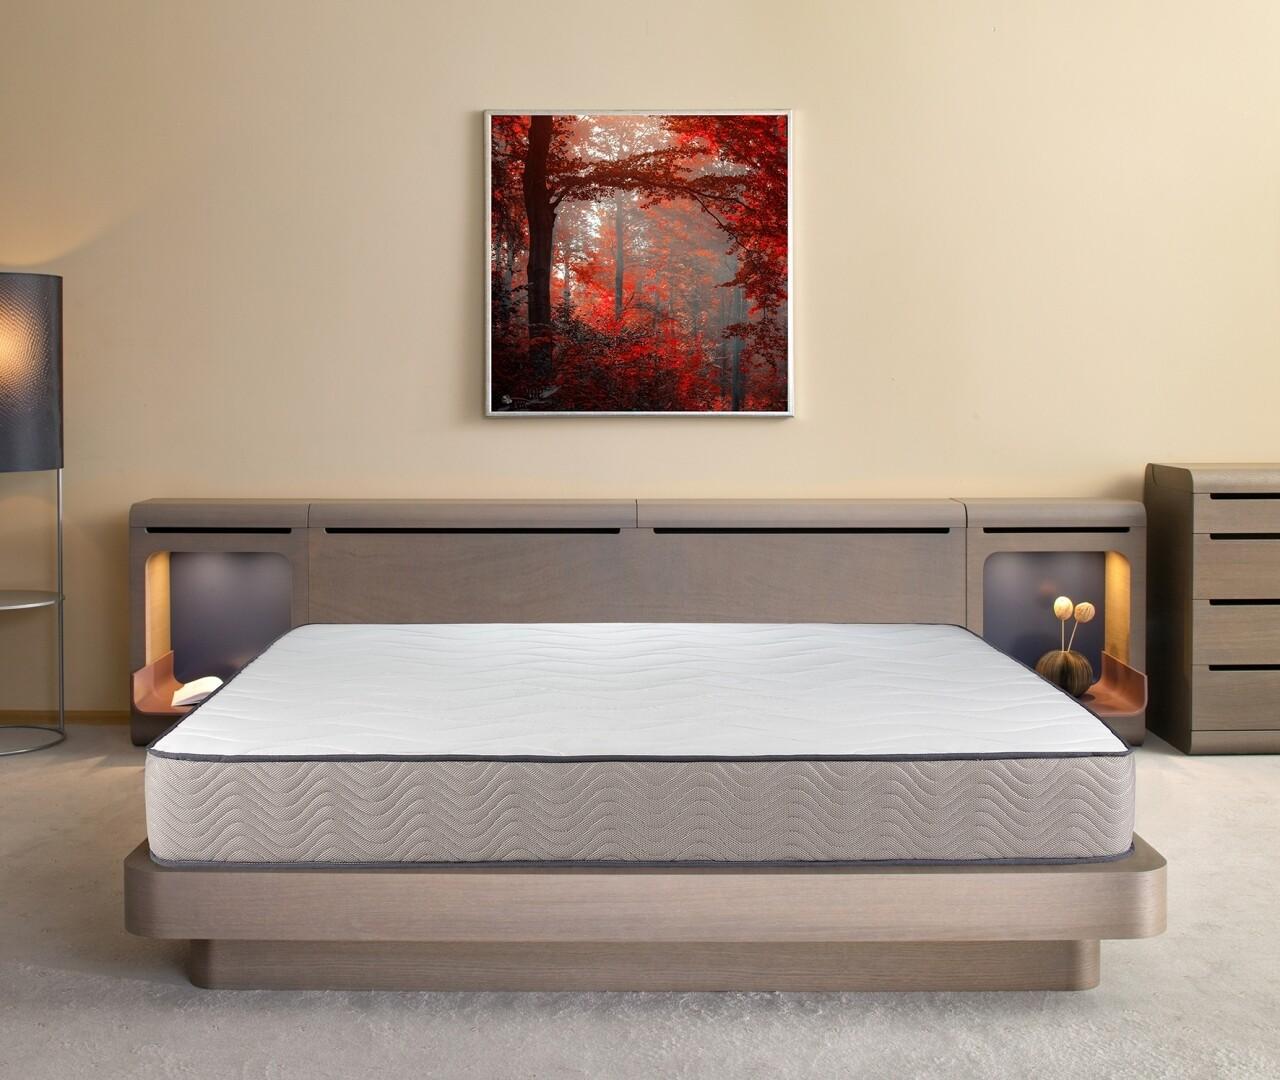 Saltea Bedora, Fresh Memory Grey Line, Ortopedica, Anatomica 90 x 200 cm